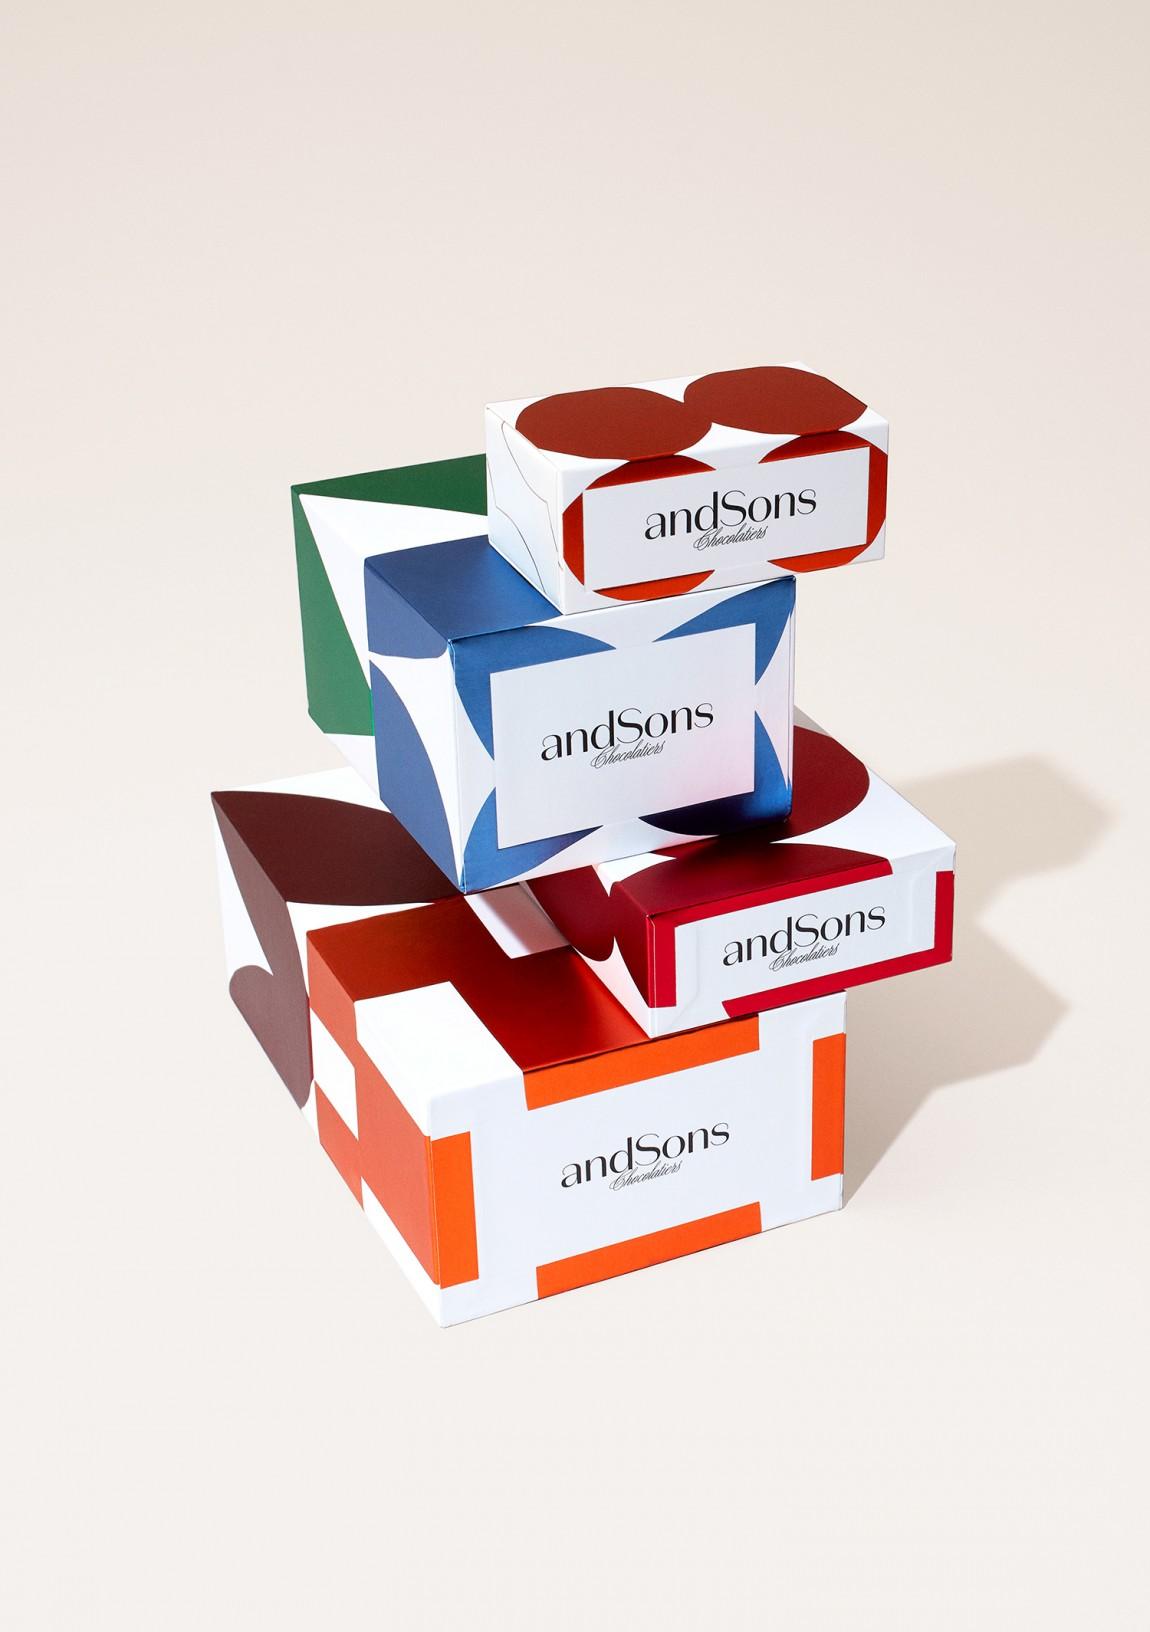 andSons视觉vi设计,logo设计,字体设计,包装设计